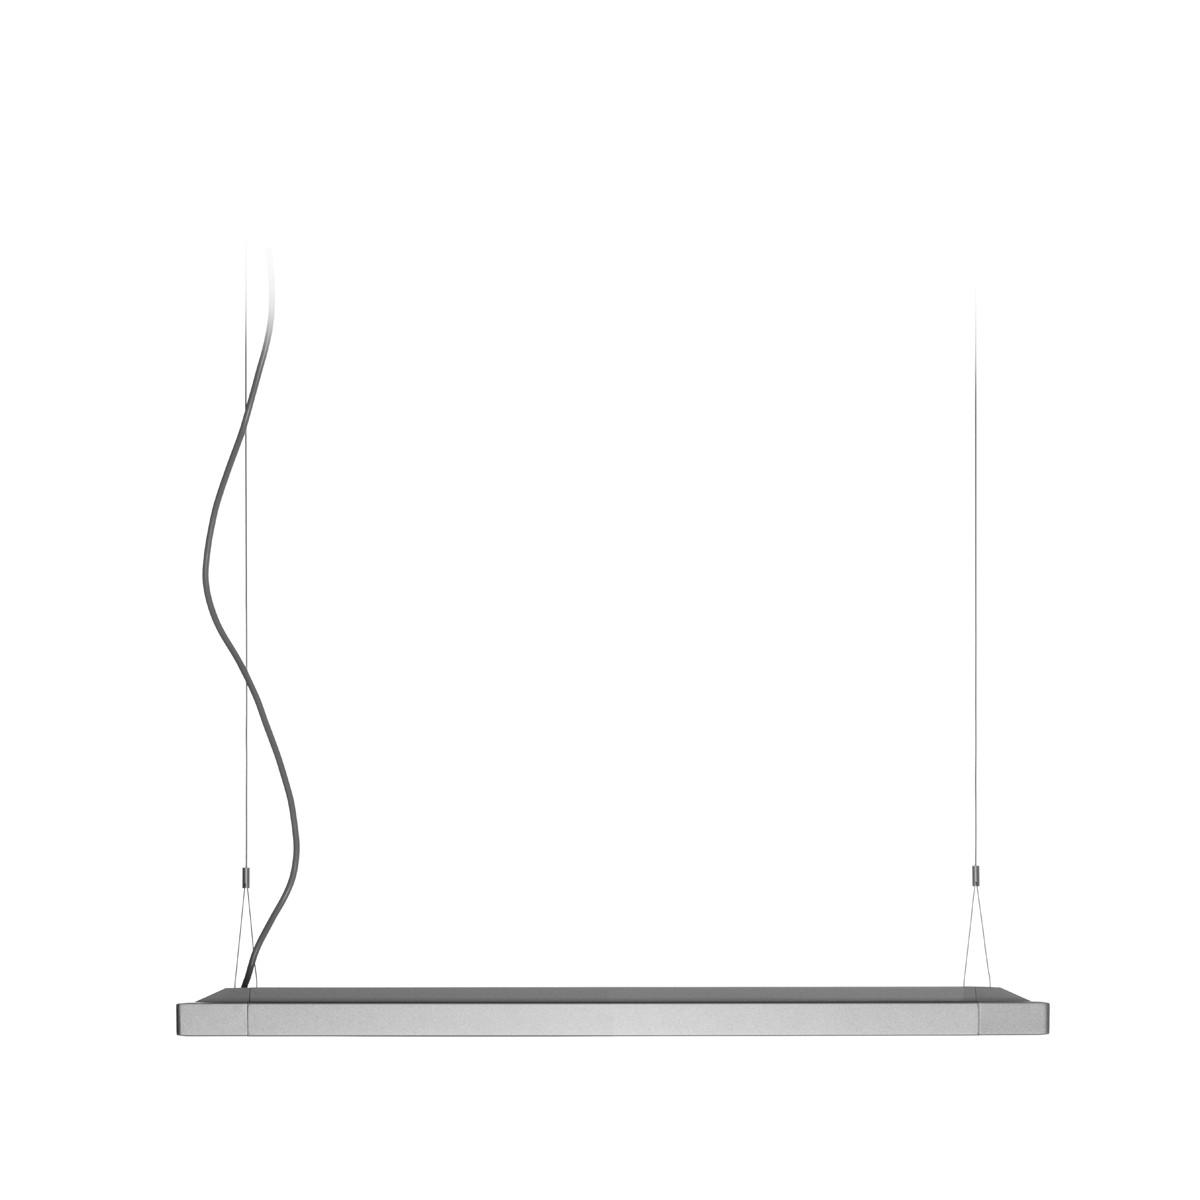 Belux Flat-30 Pendelleuchte, 2-Stufenschaltung, Aluminium